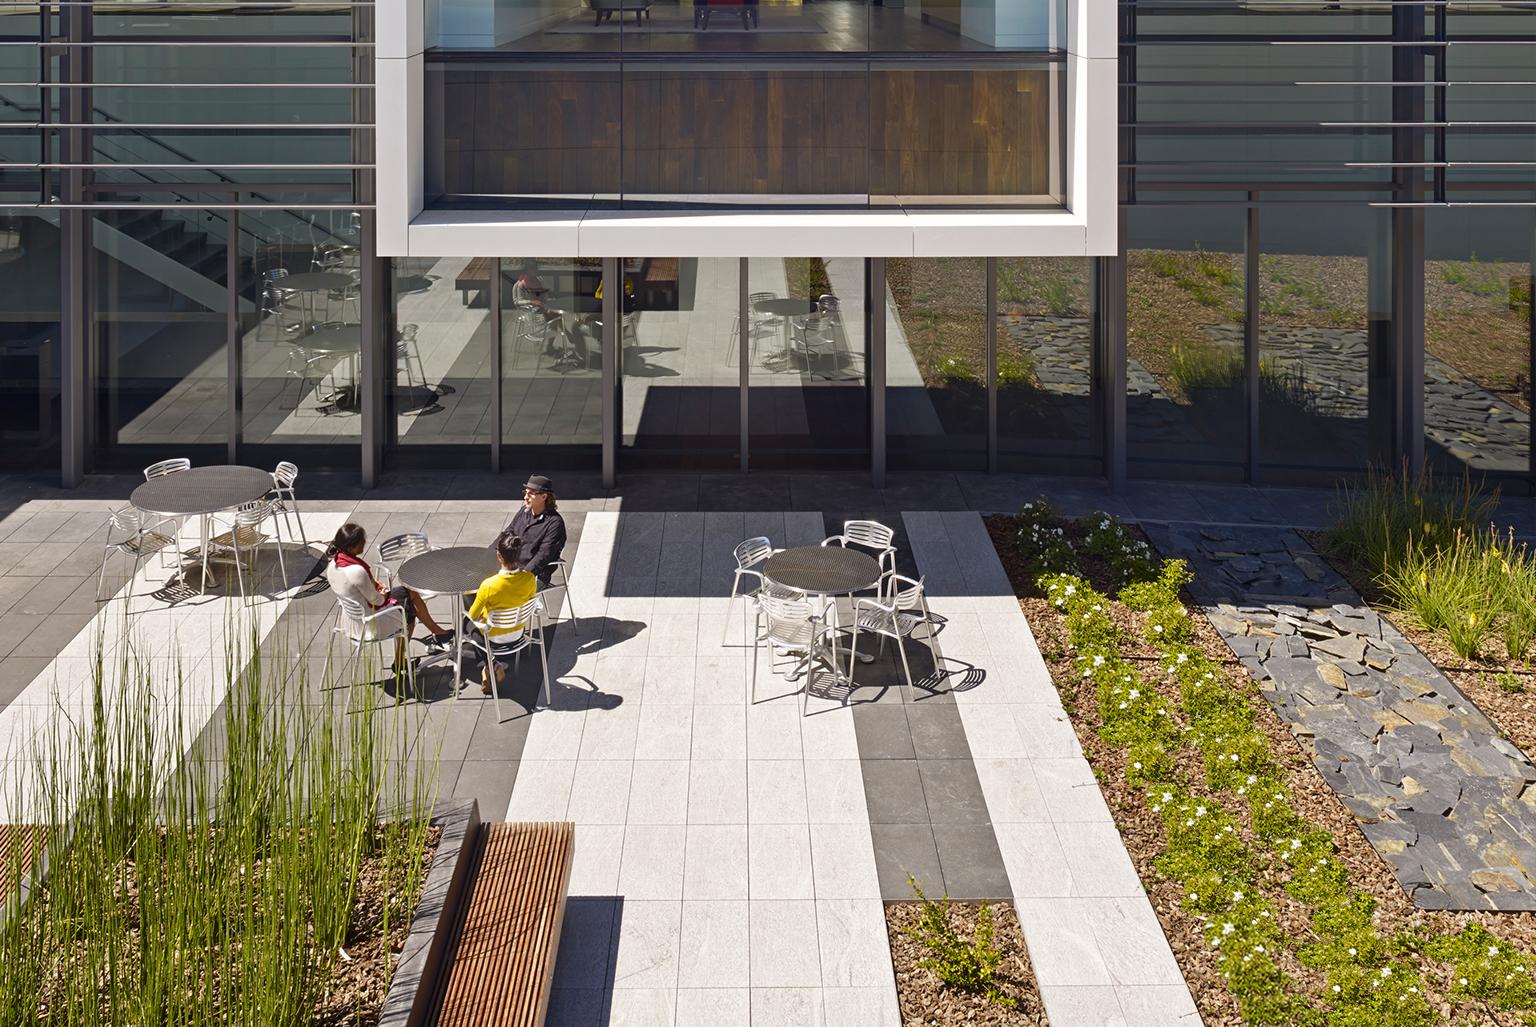 International Technology Campus, Executive Briefing Center